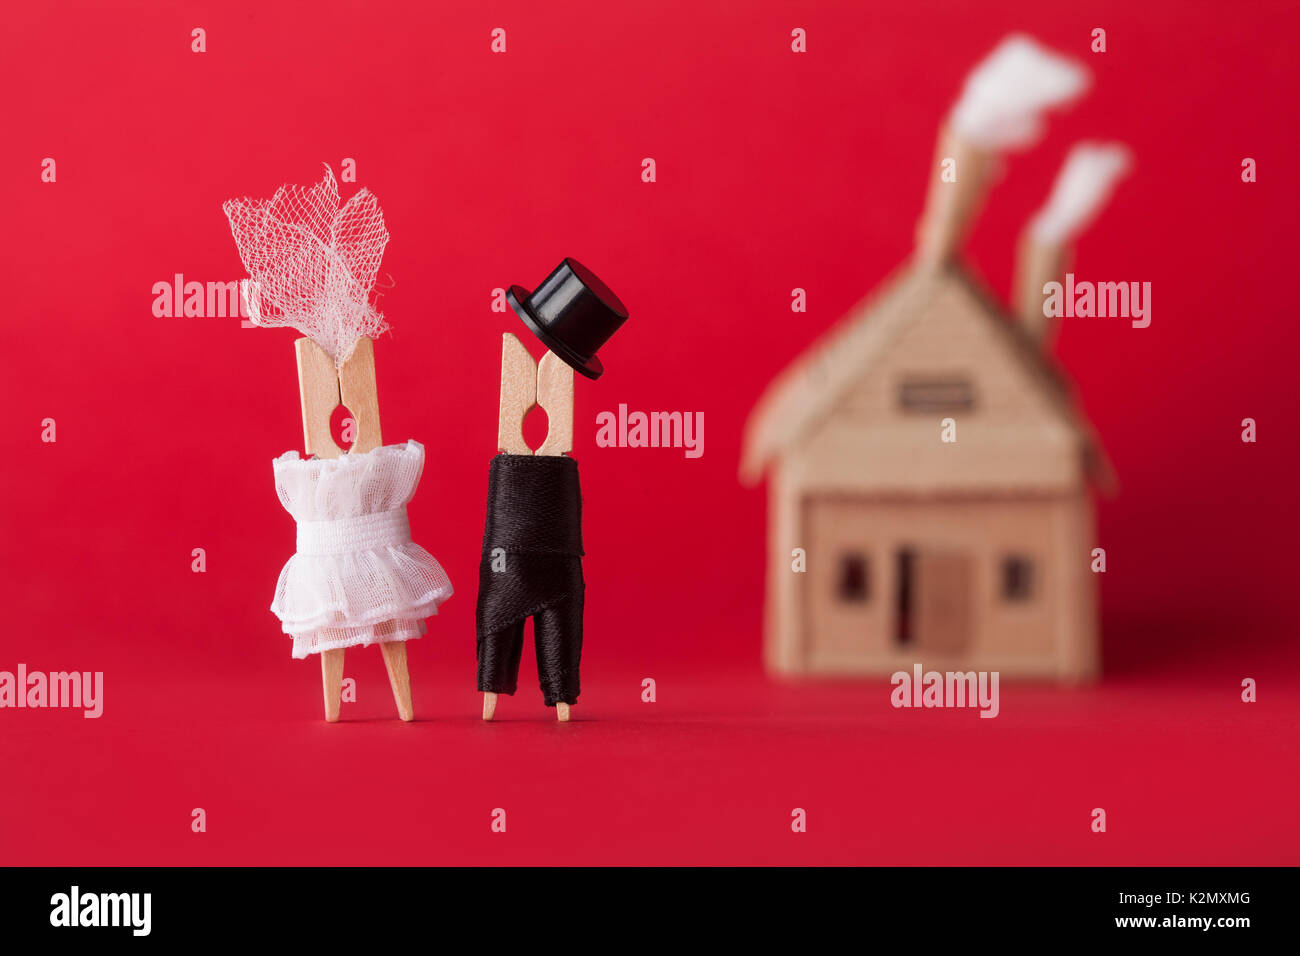 Wedding invitation and love concept. Bride groom clothespin peg ...